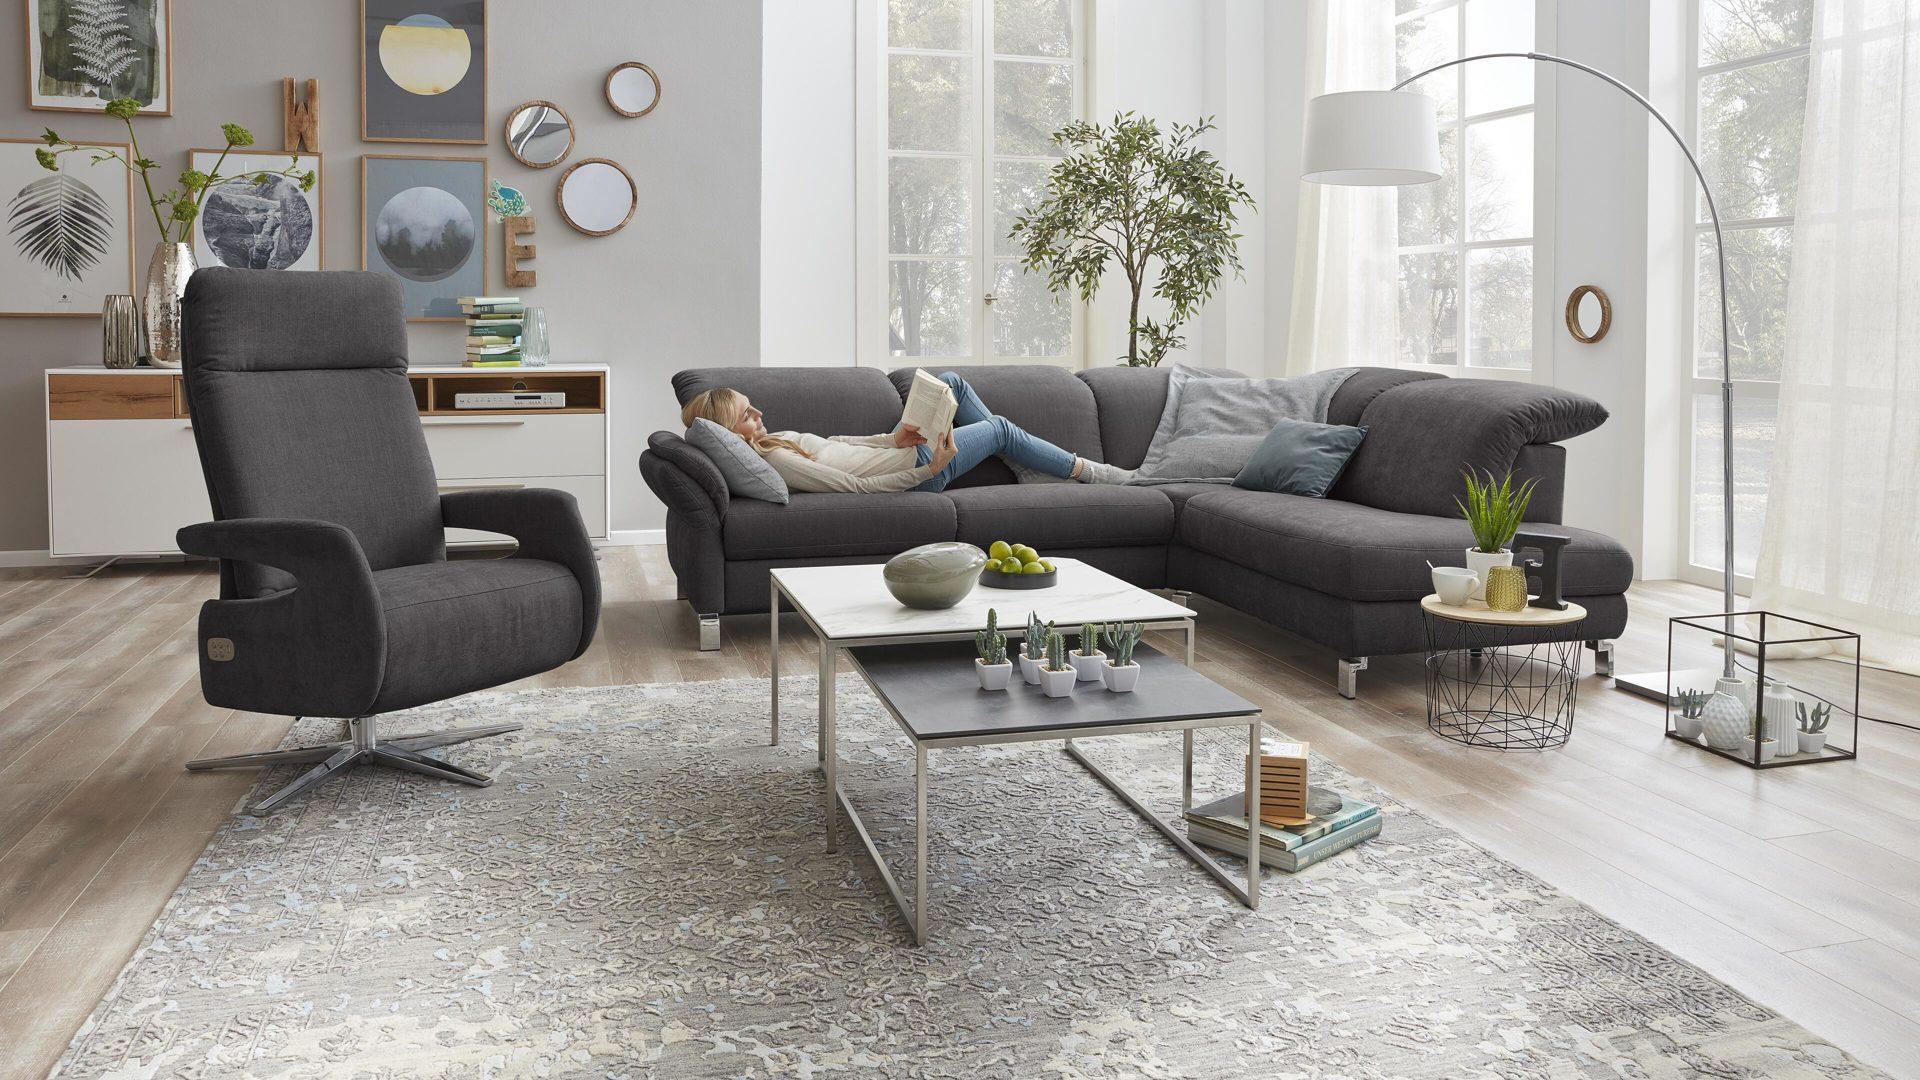 Interliving Sofa Serie 4101 Eckkombination Dunkelgrauer Bezug